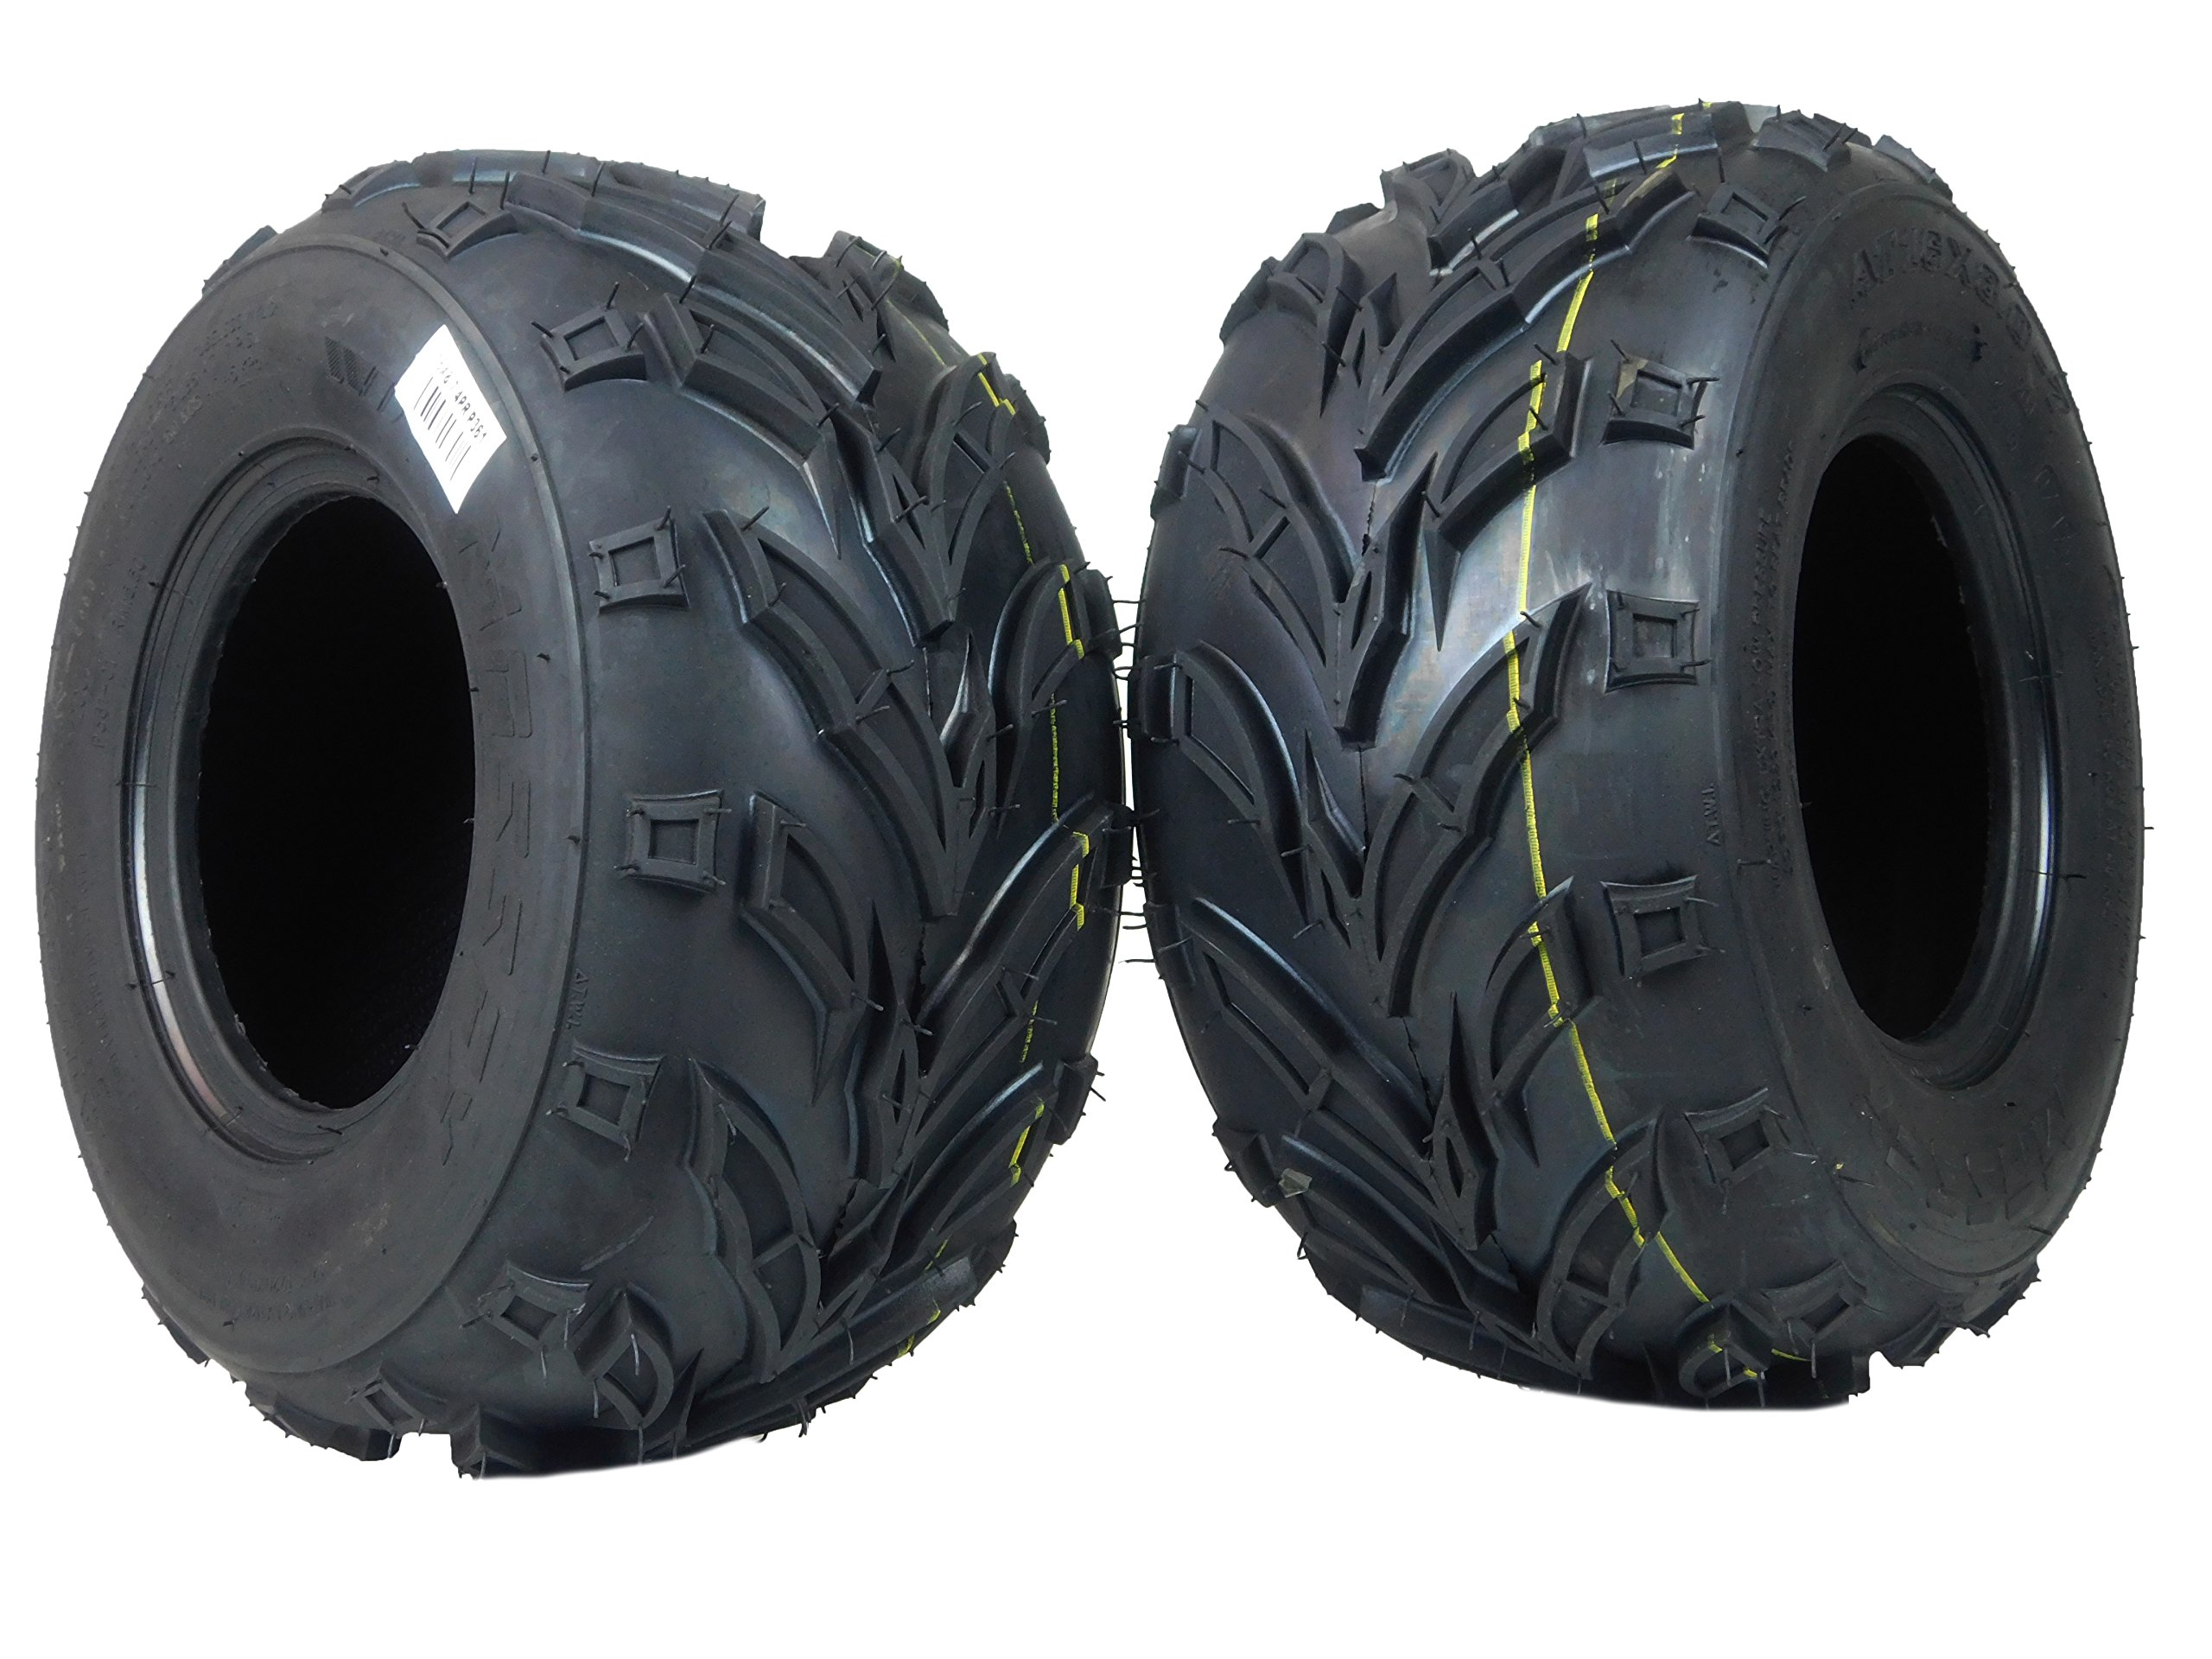 New 2 Pack of 16x8.00-7 MASSFX ATV/ATC Tires Tire 16x8-7 16/8-7 16x8x7